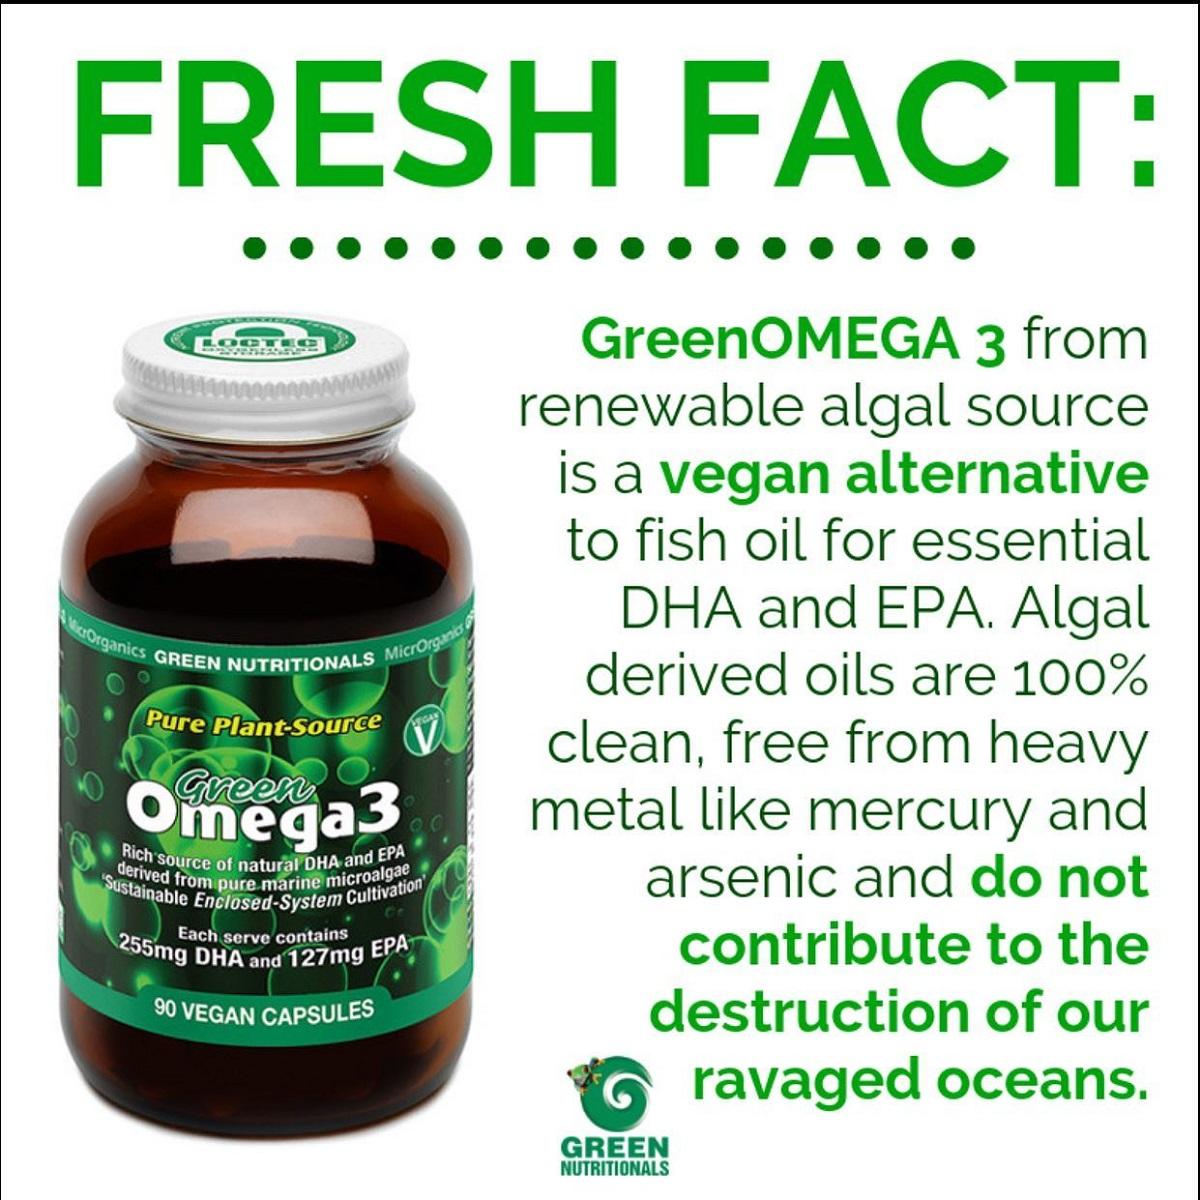 MicrOrganics Green Nutrit Green Omega3_media-01